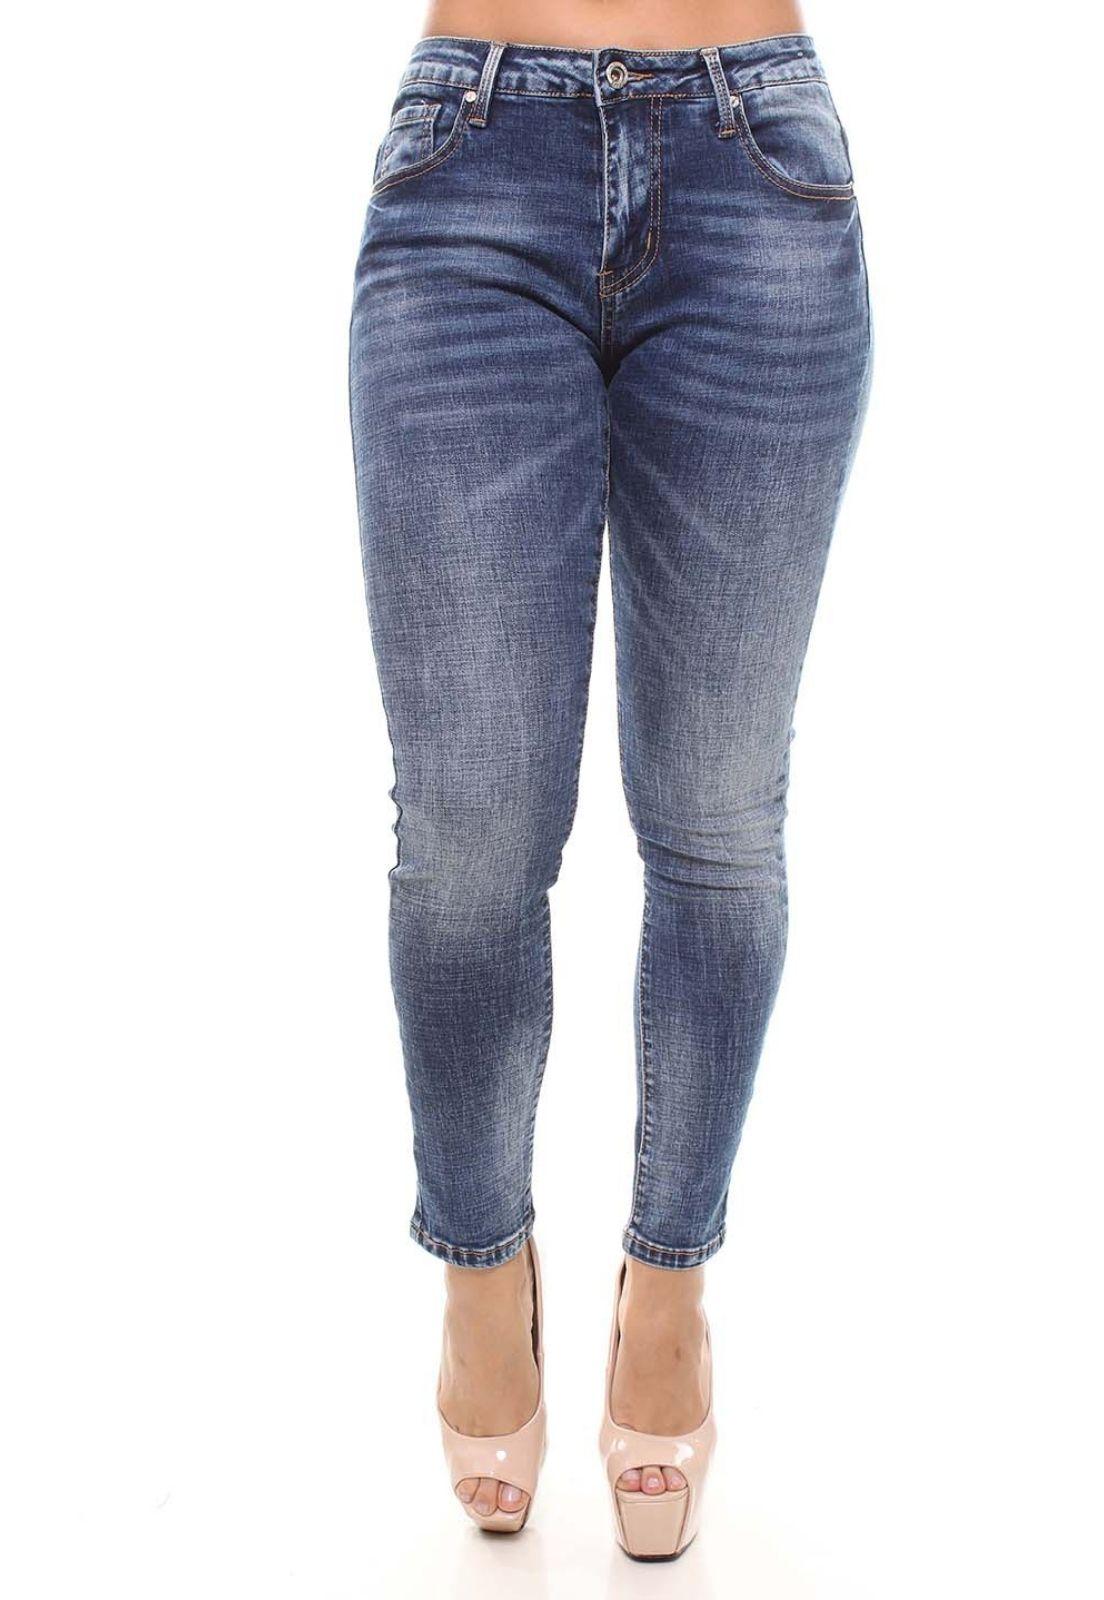 Cigarrete Jeans Feminina Crocker - 46393  - CROCKER JEANS